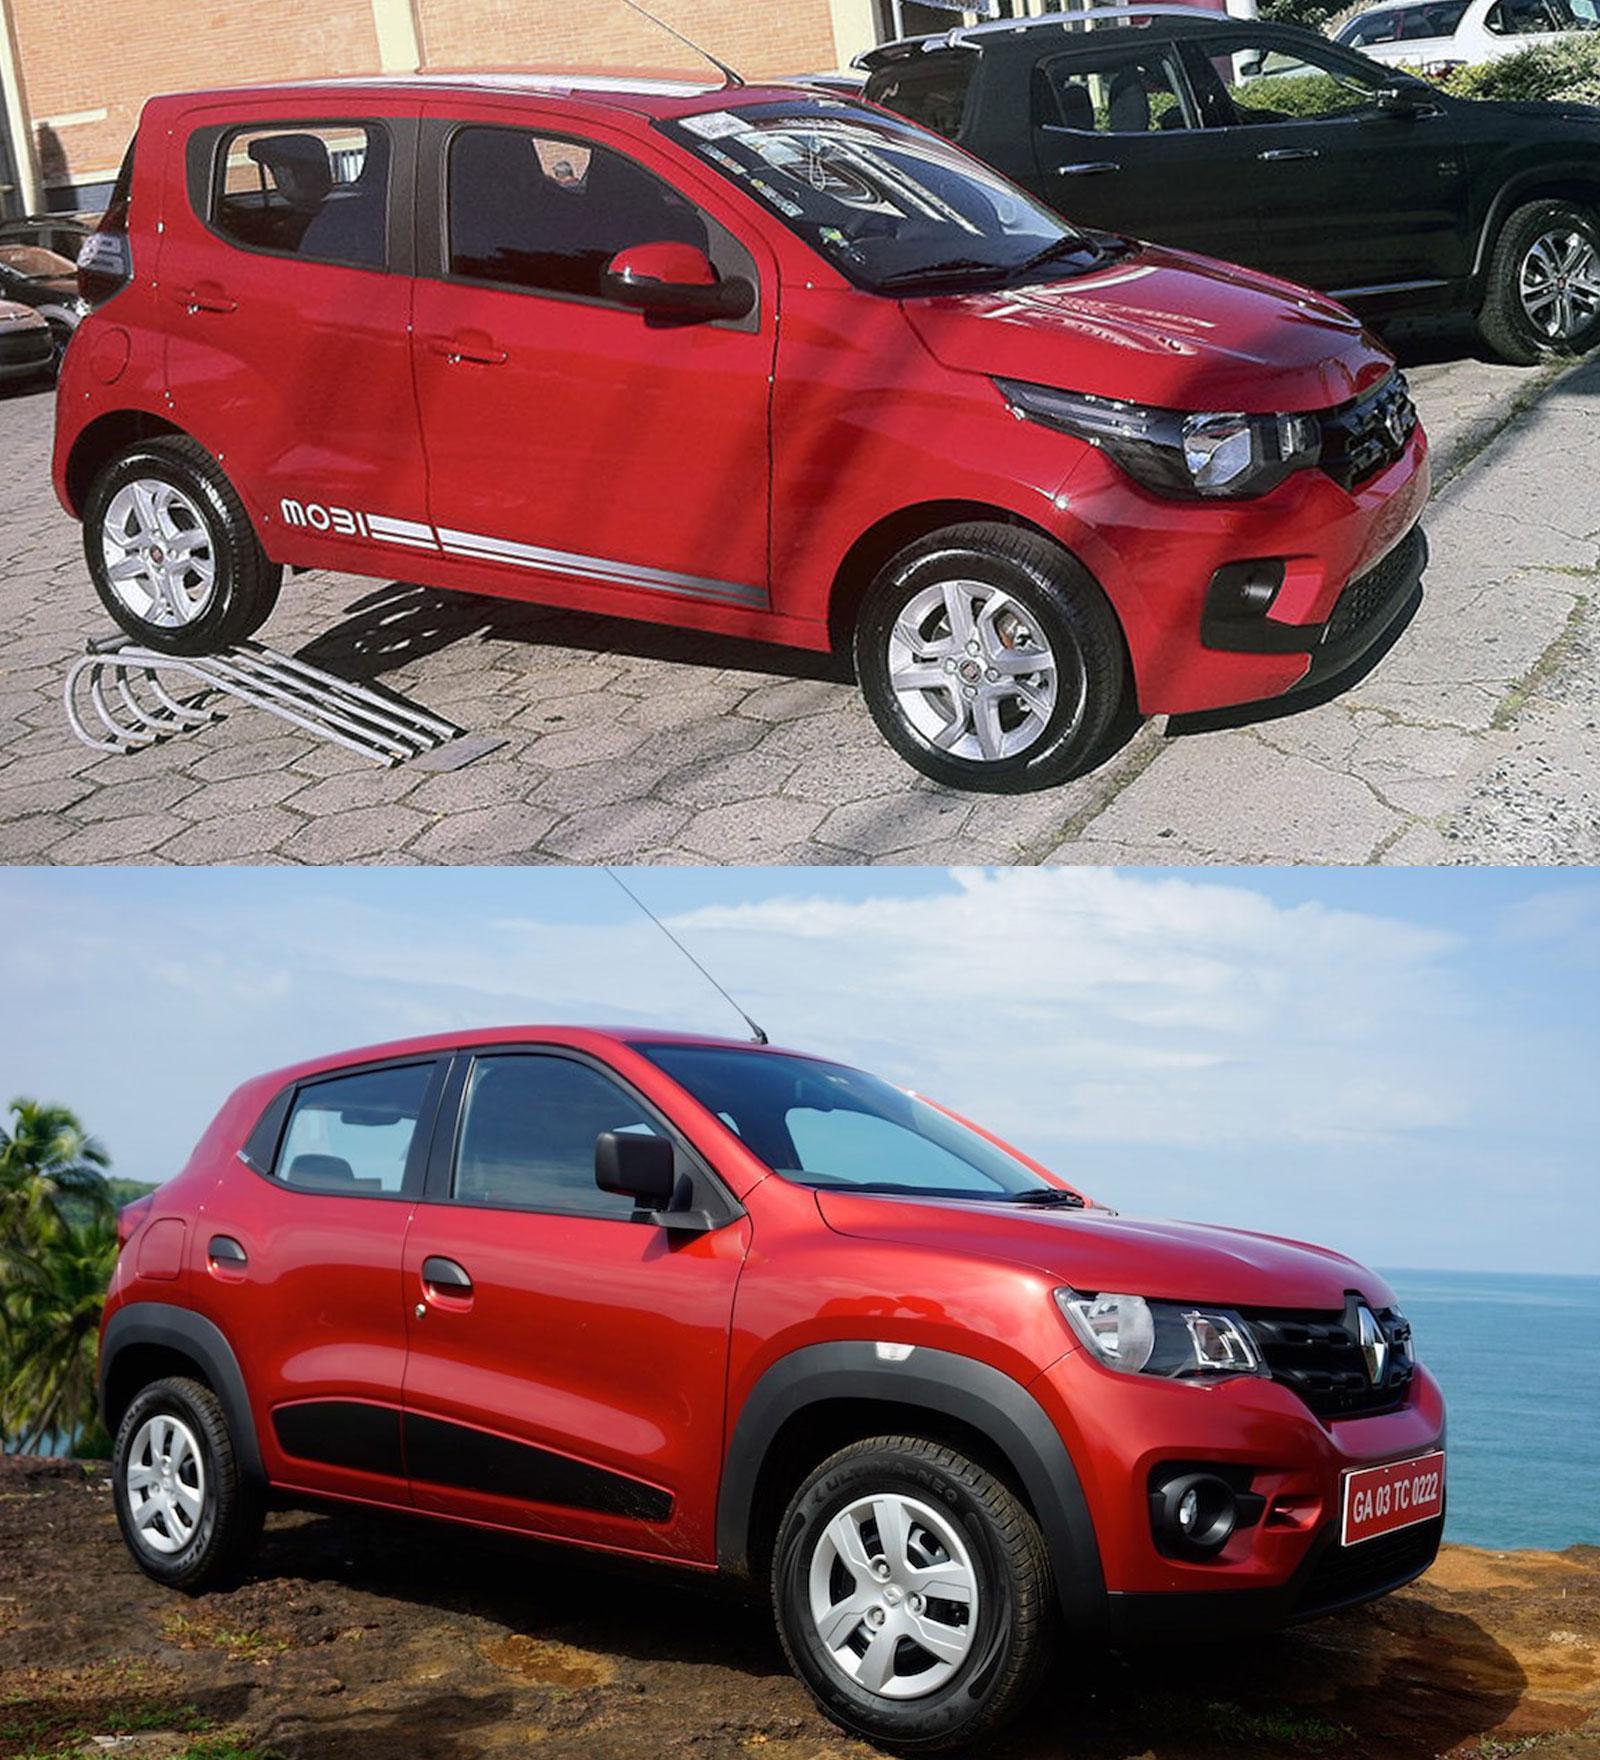 Fiat Mobi vs. Renault Kwid front three quarters